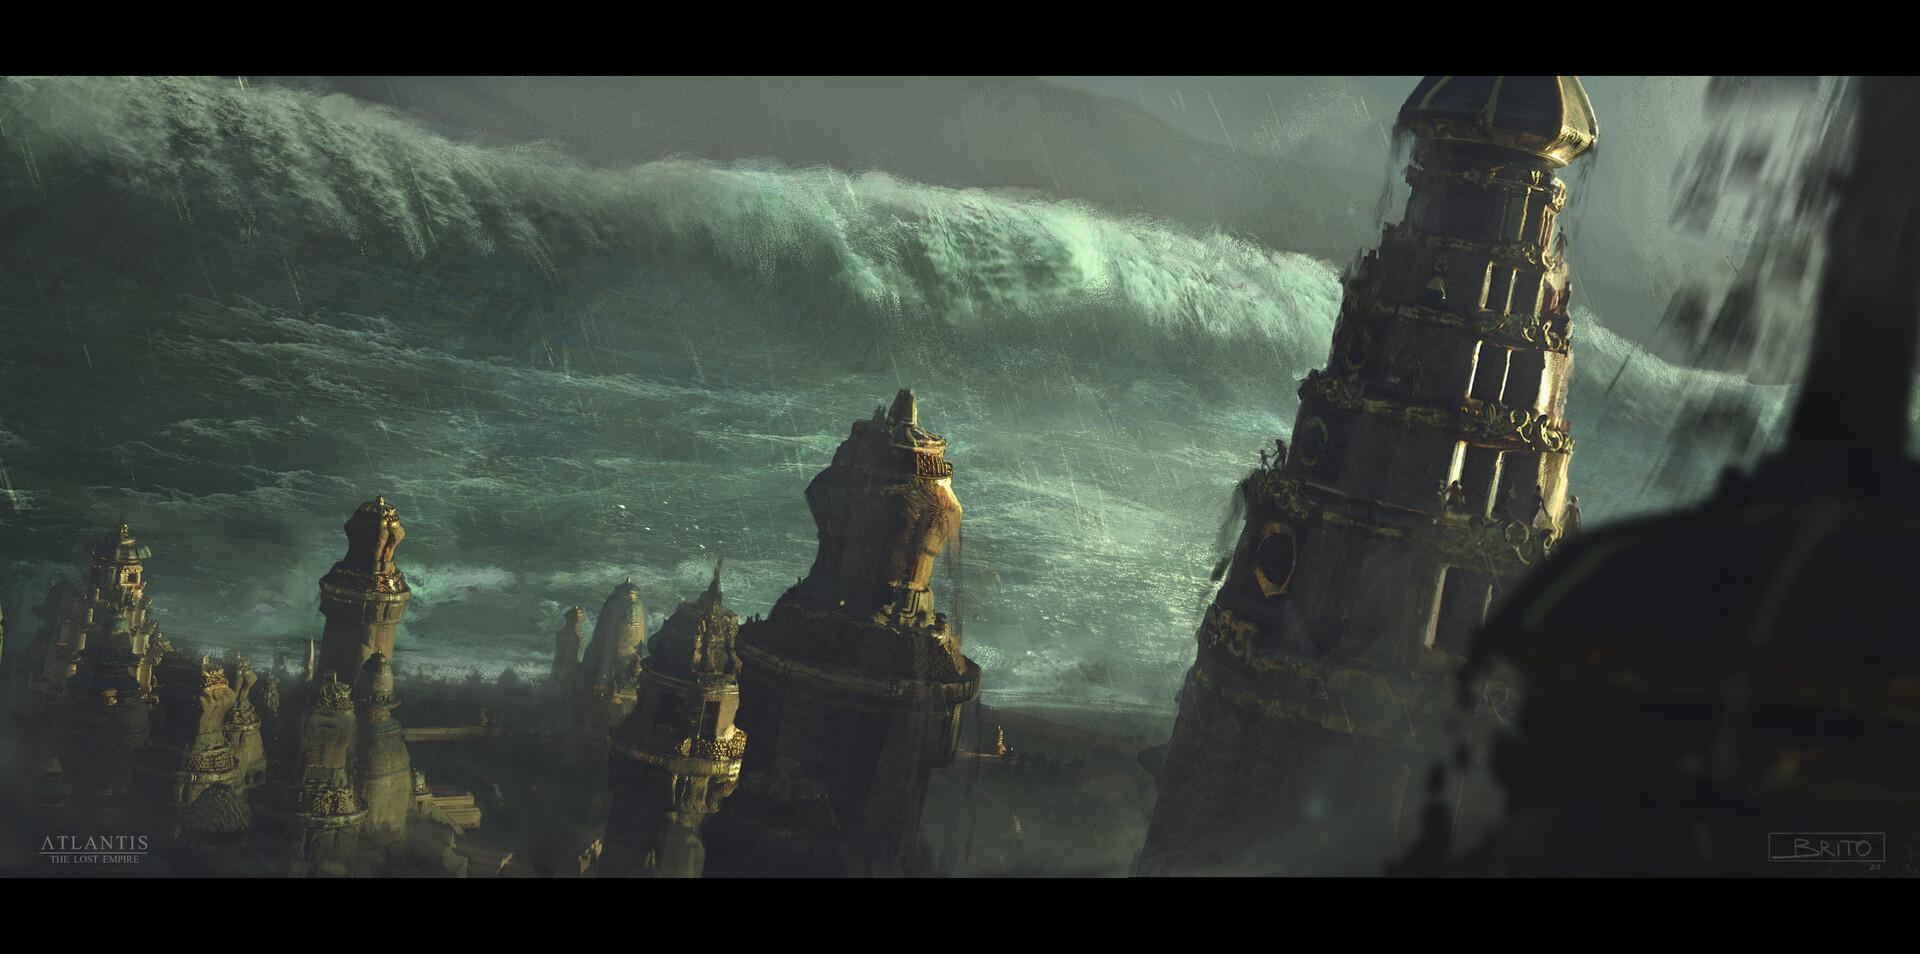 Atlantide, l'Empire Perdu [Walt Disney - 2001] - Page 8 Eduardo-brito-opening-shot-2